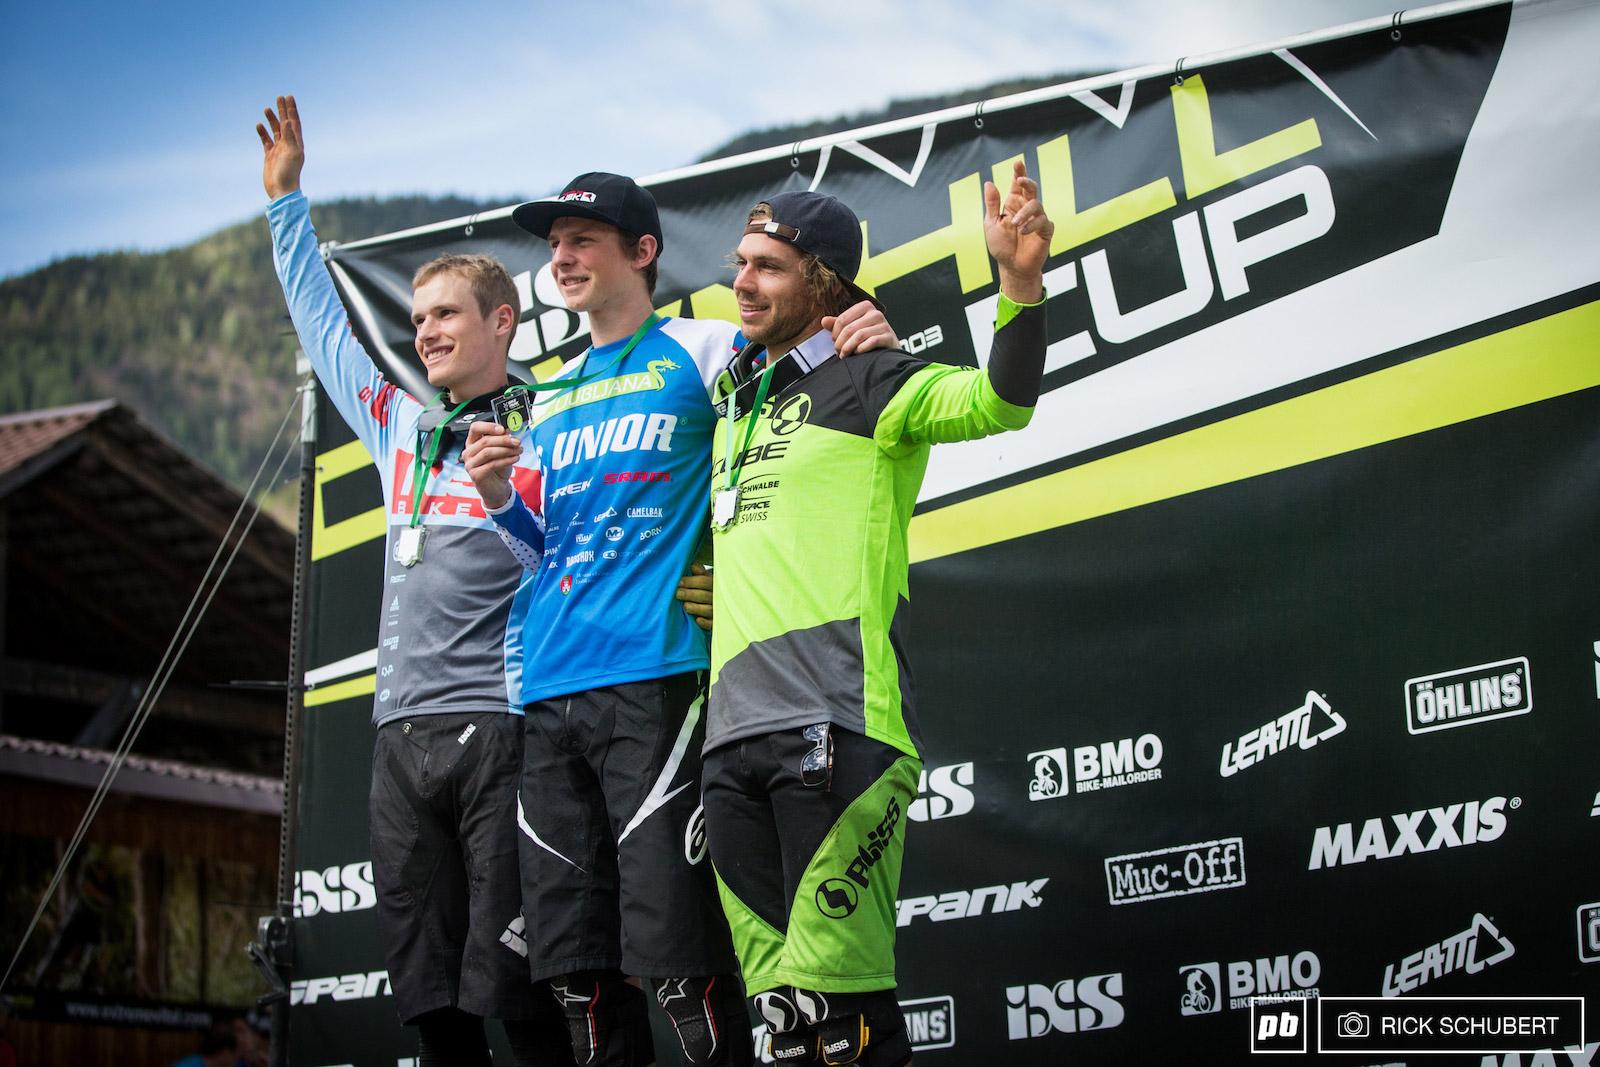 Jure ZABJEK, Slawomir LUKASIK et Matt WALKER sur le podium. © Rick Schubert